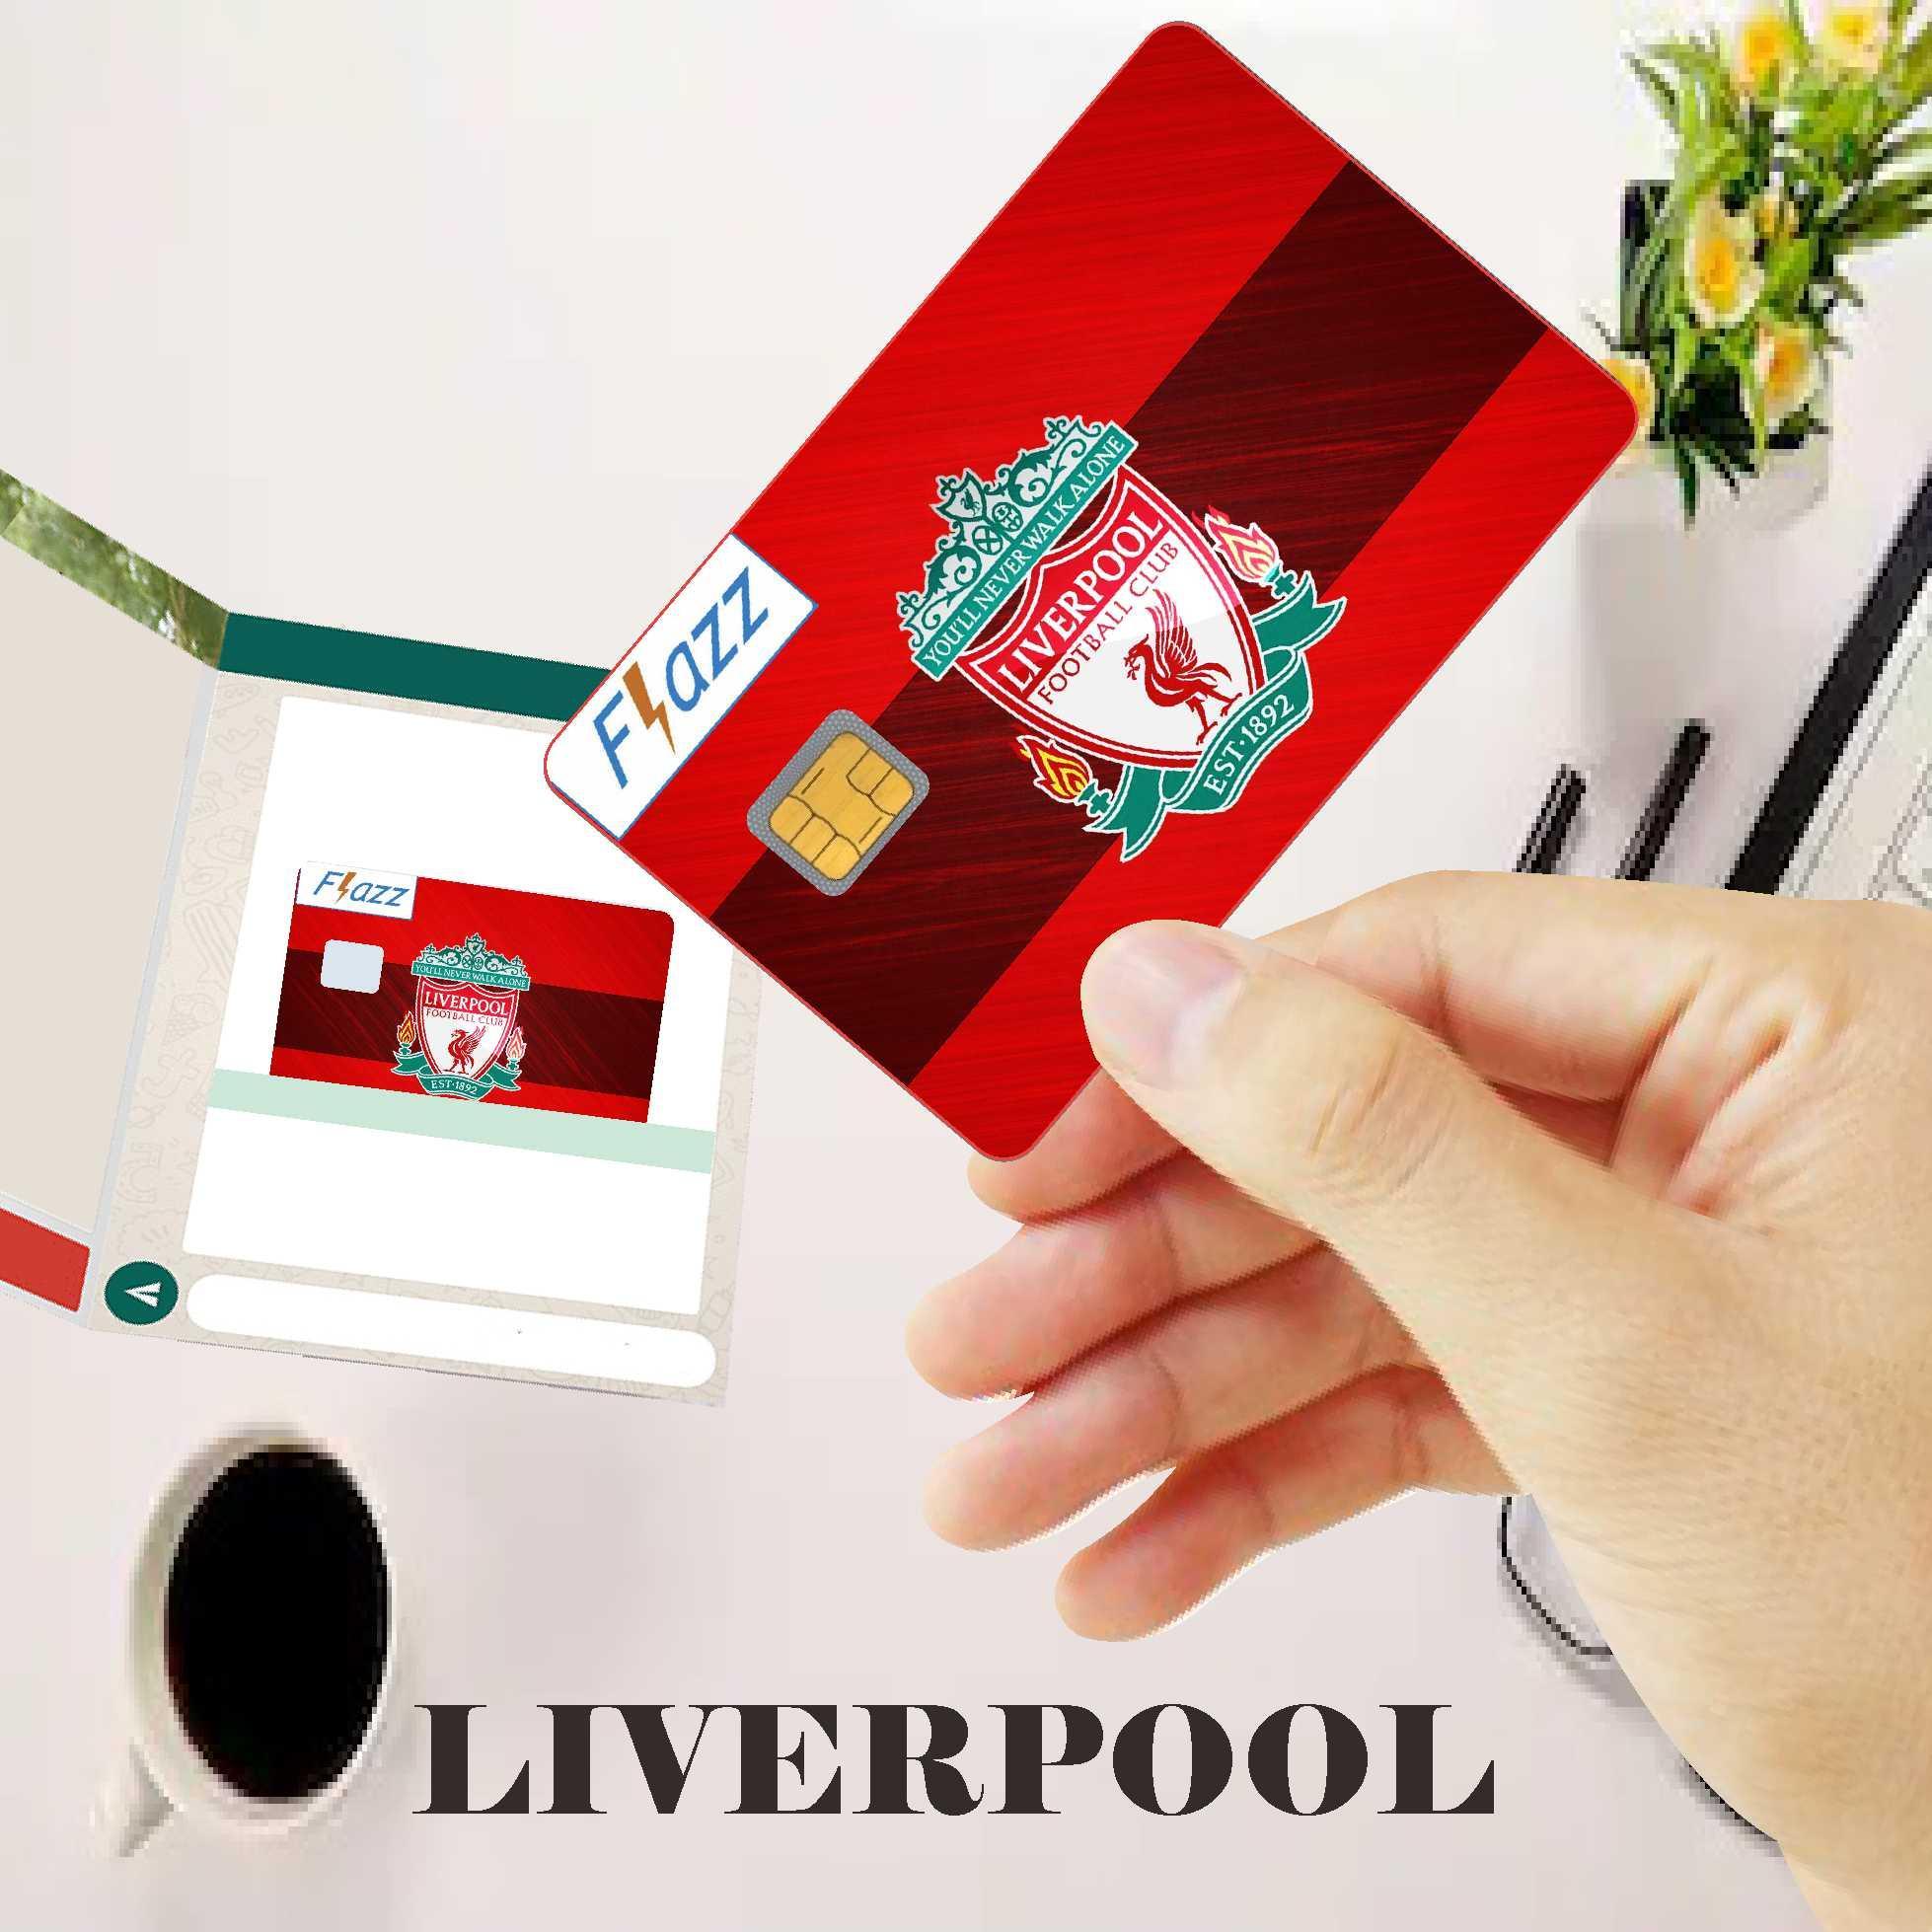 Stiker Sticker Bola LIVERPOOL Kartu Bank Flazz E money E toll